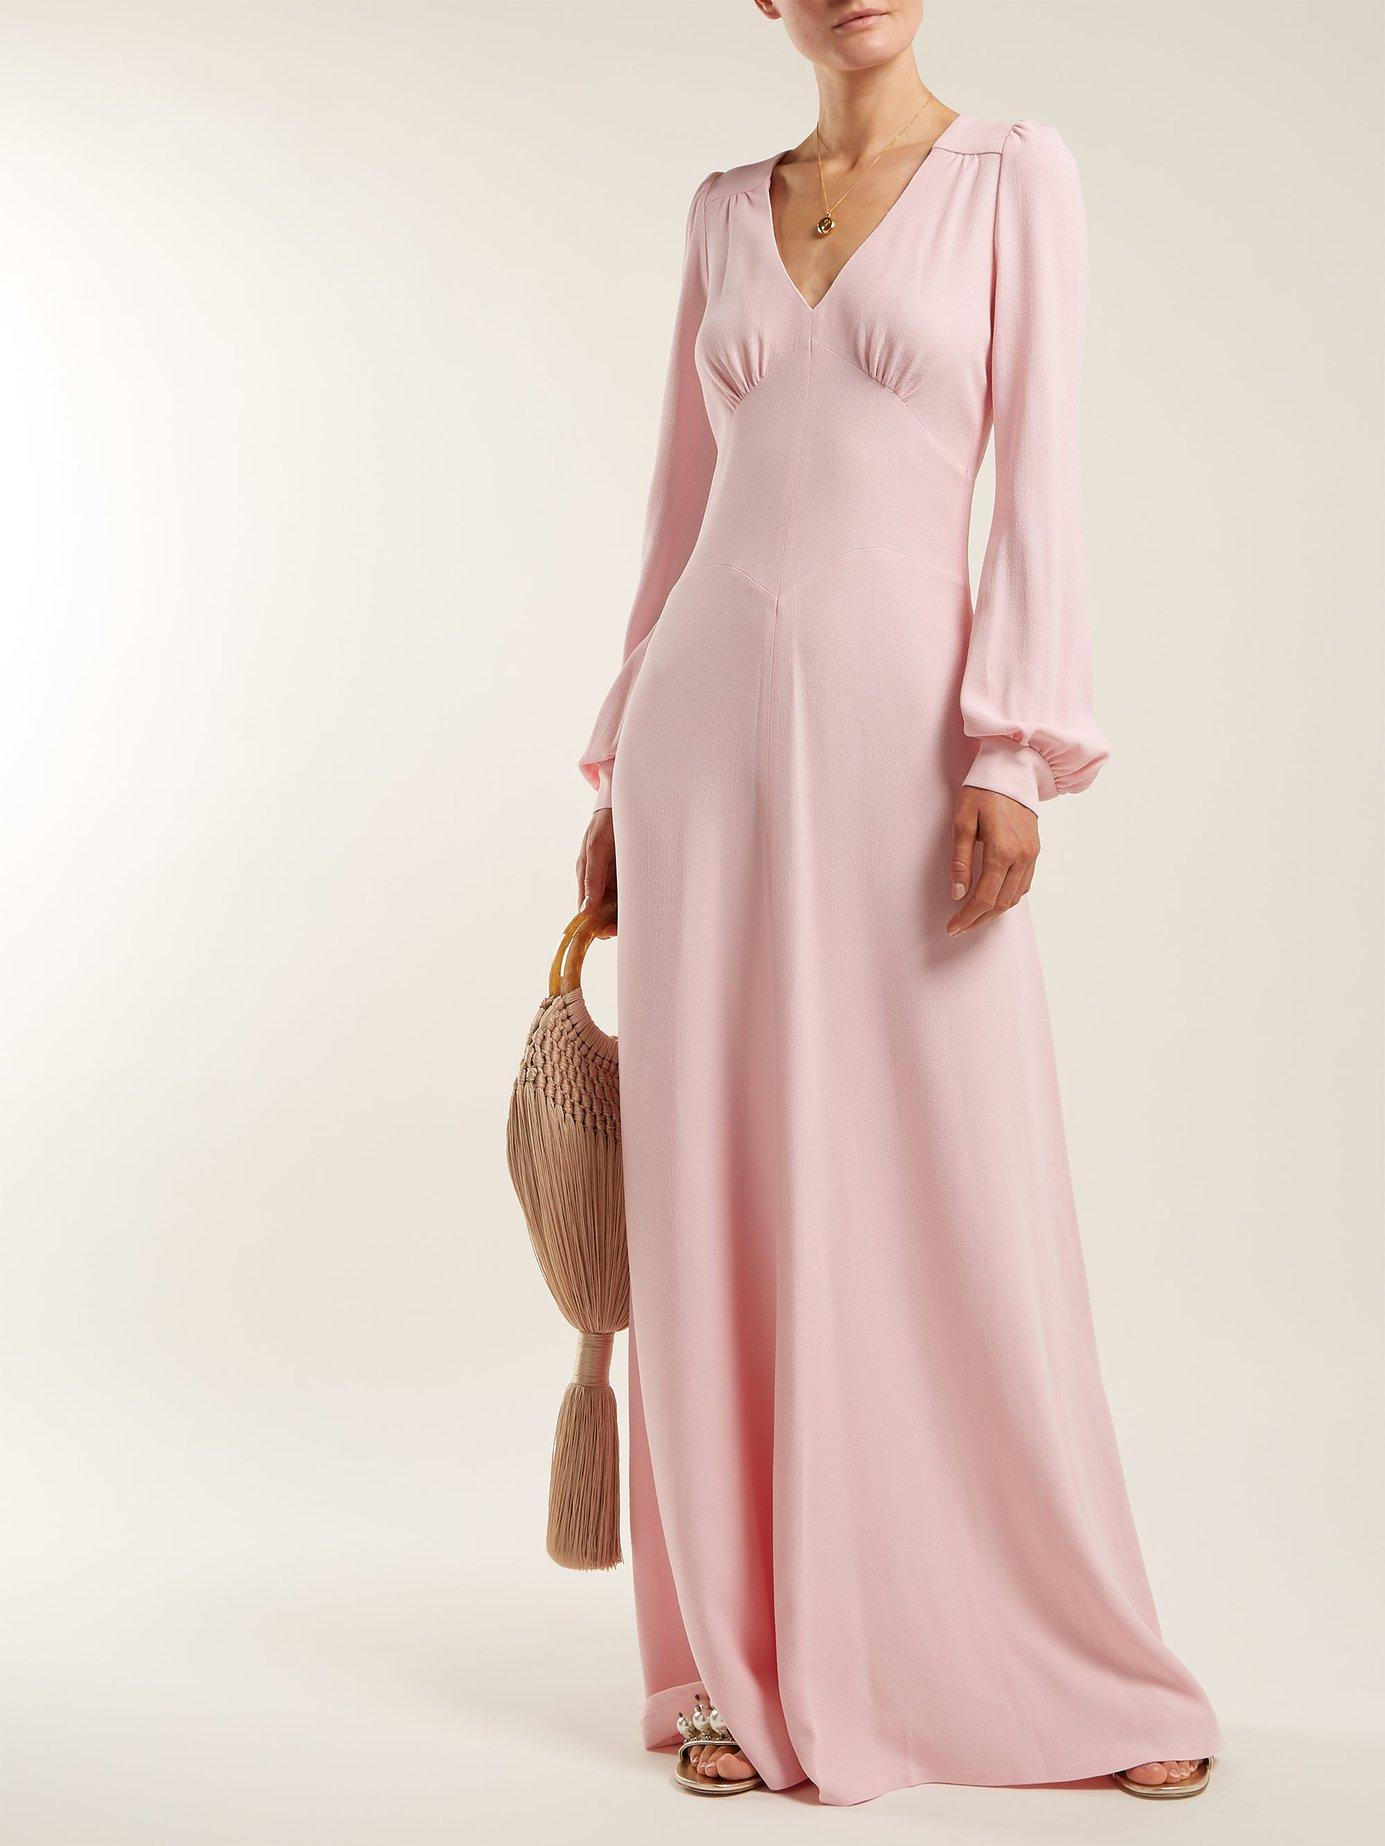 Nova crepe puff-shoulder dress by Bella Freud